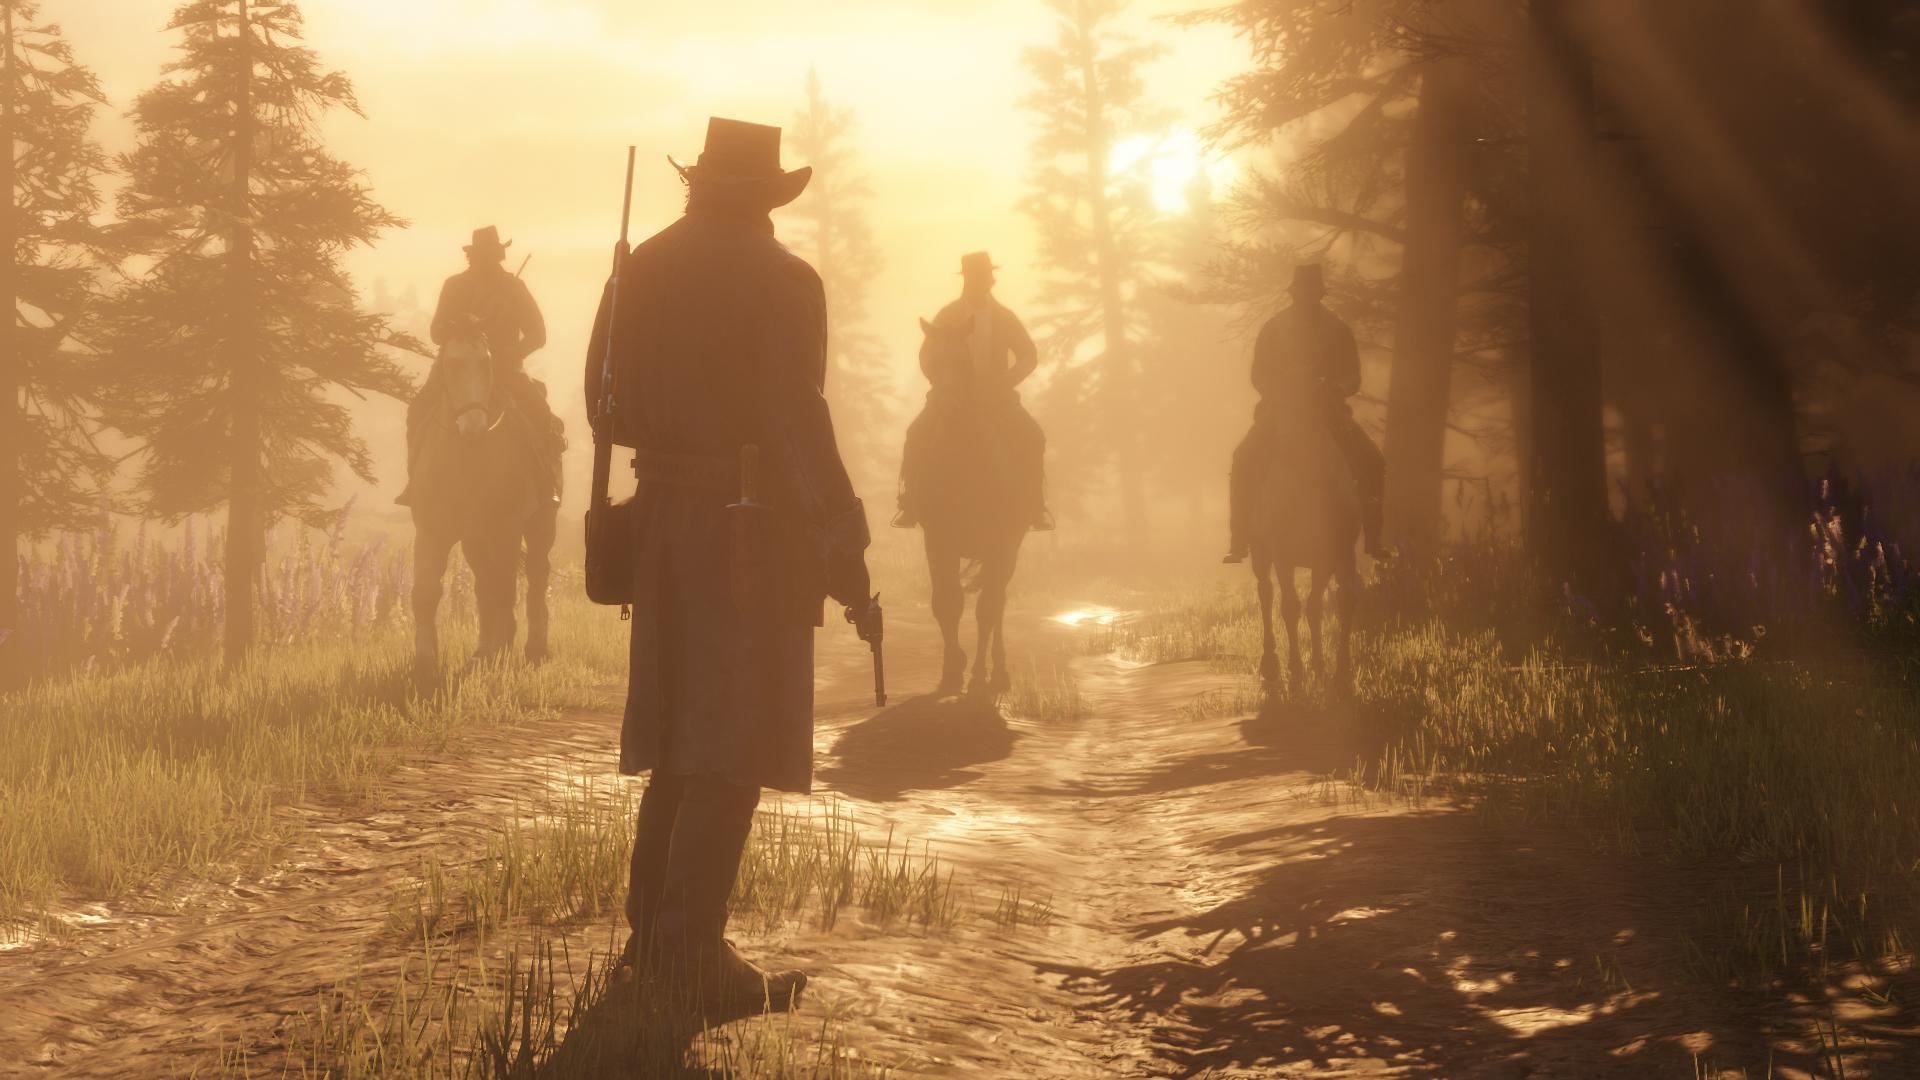 بازی رد دد ریدمپشن 2 (Red Dead Redemption 2)